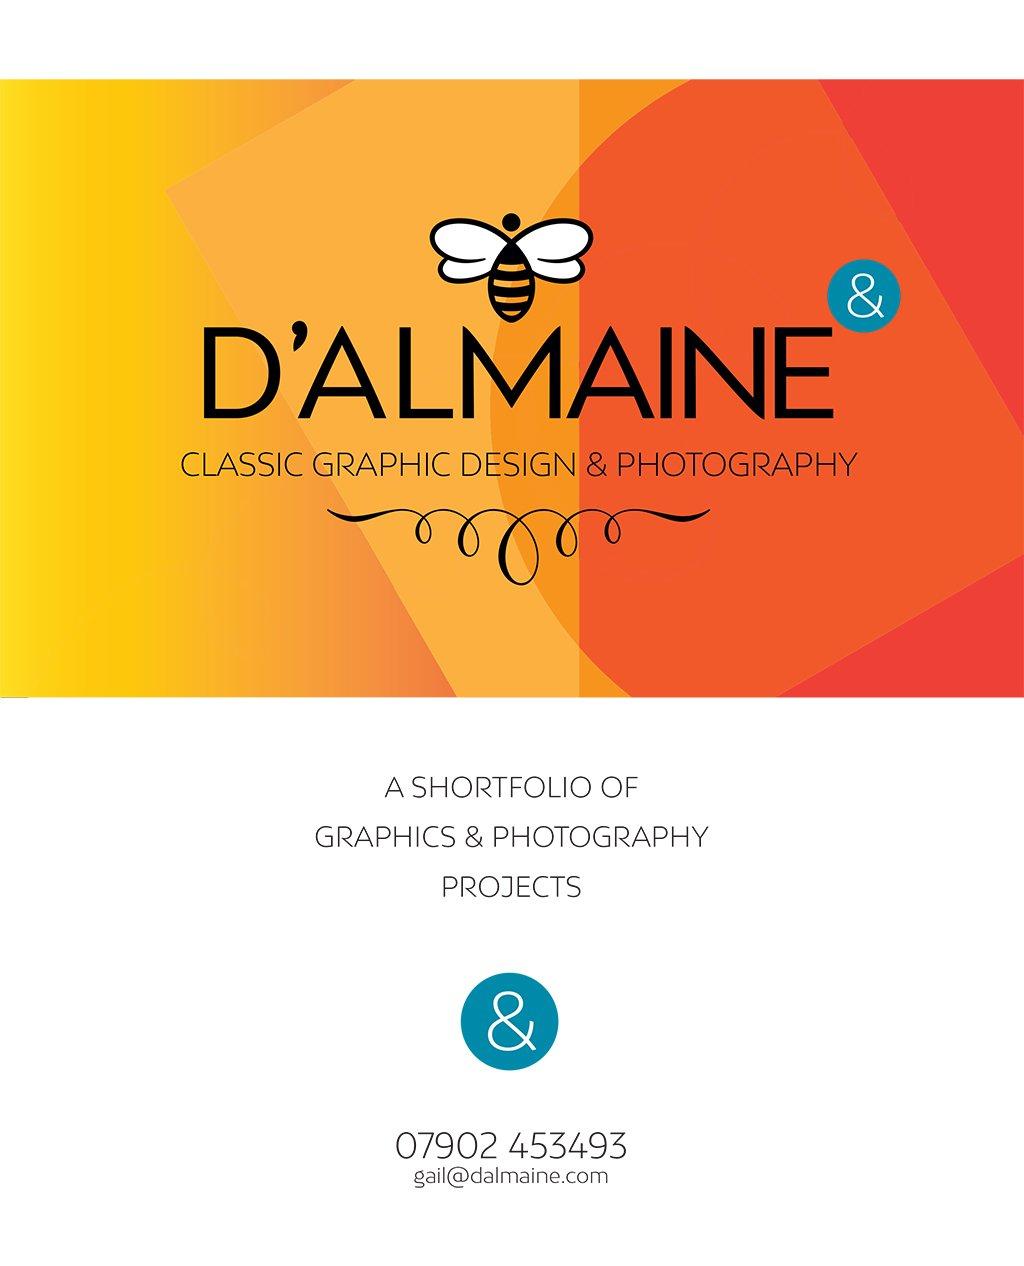 D'Almaine Shortfolio graphics and photography download